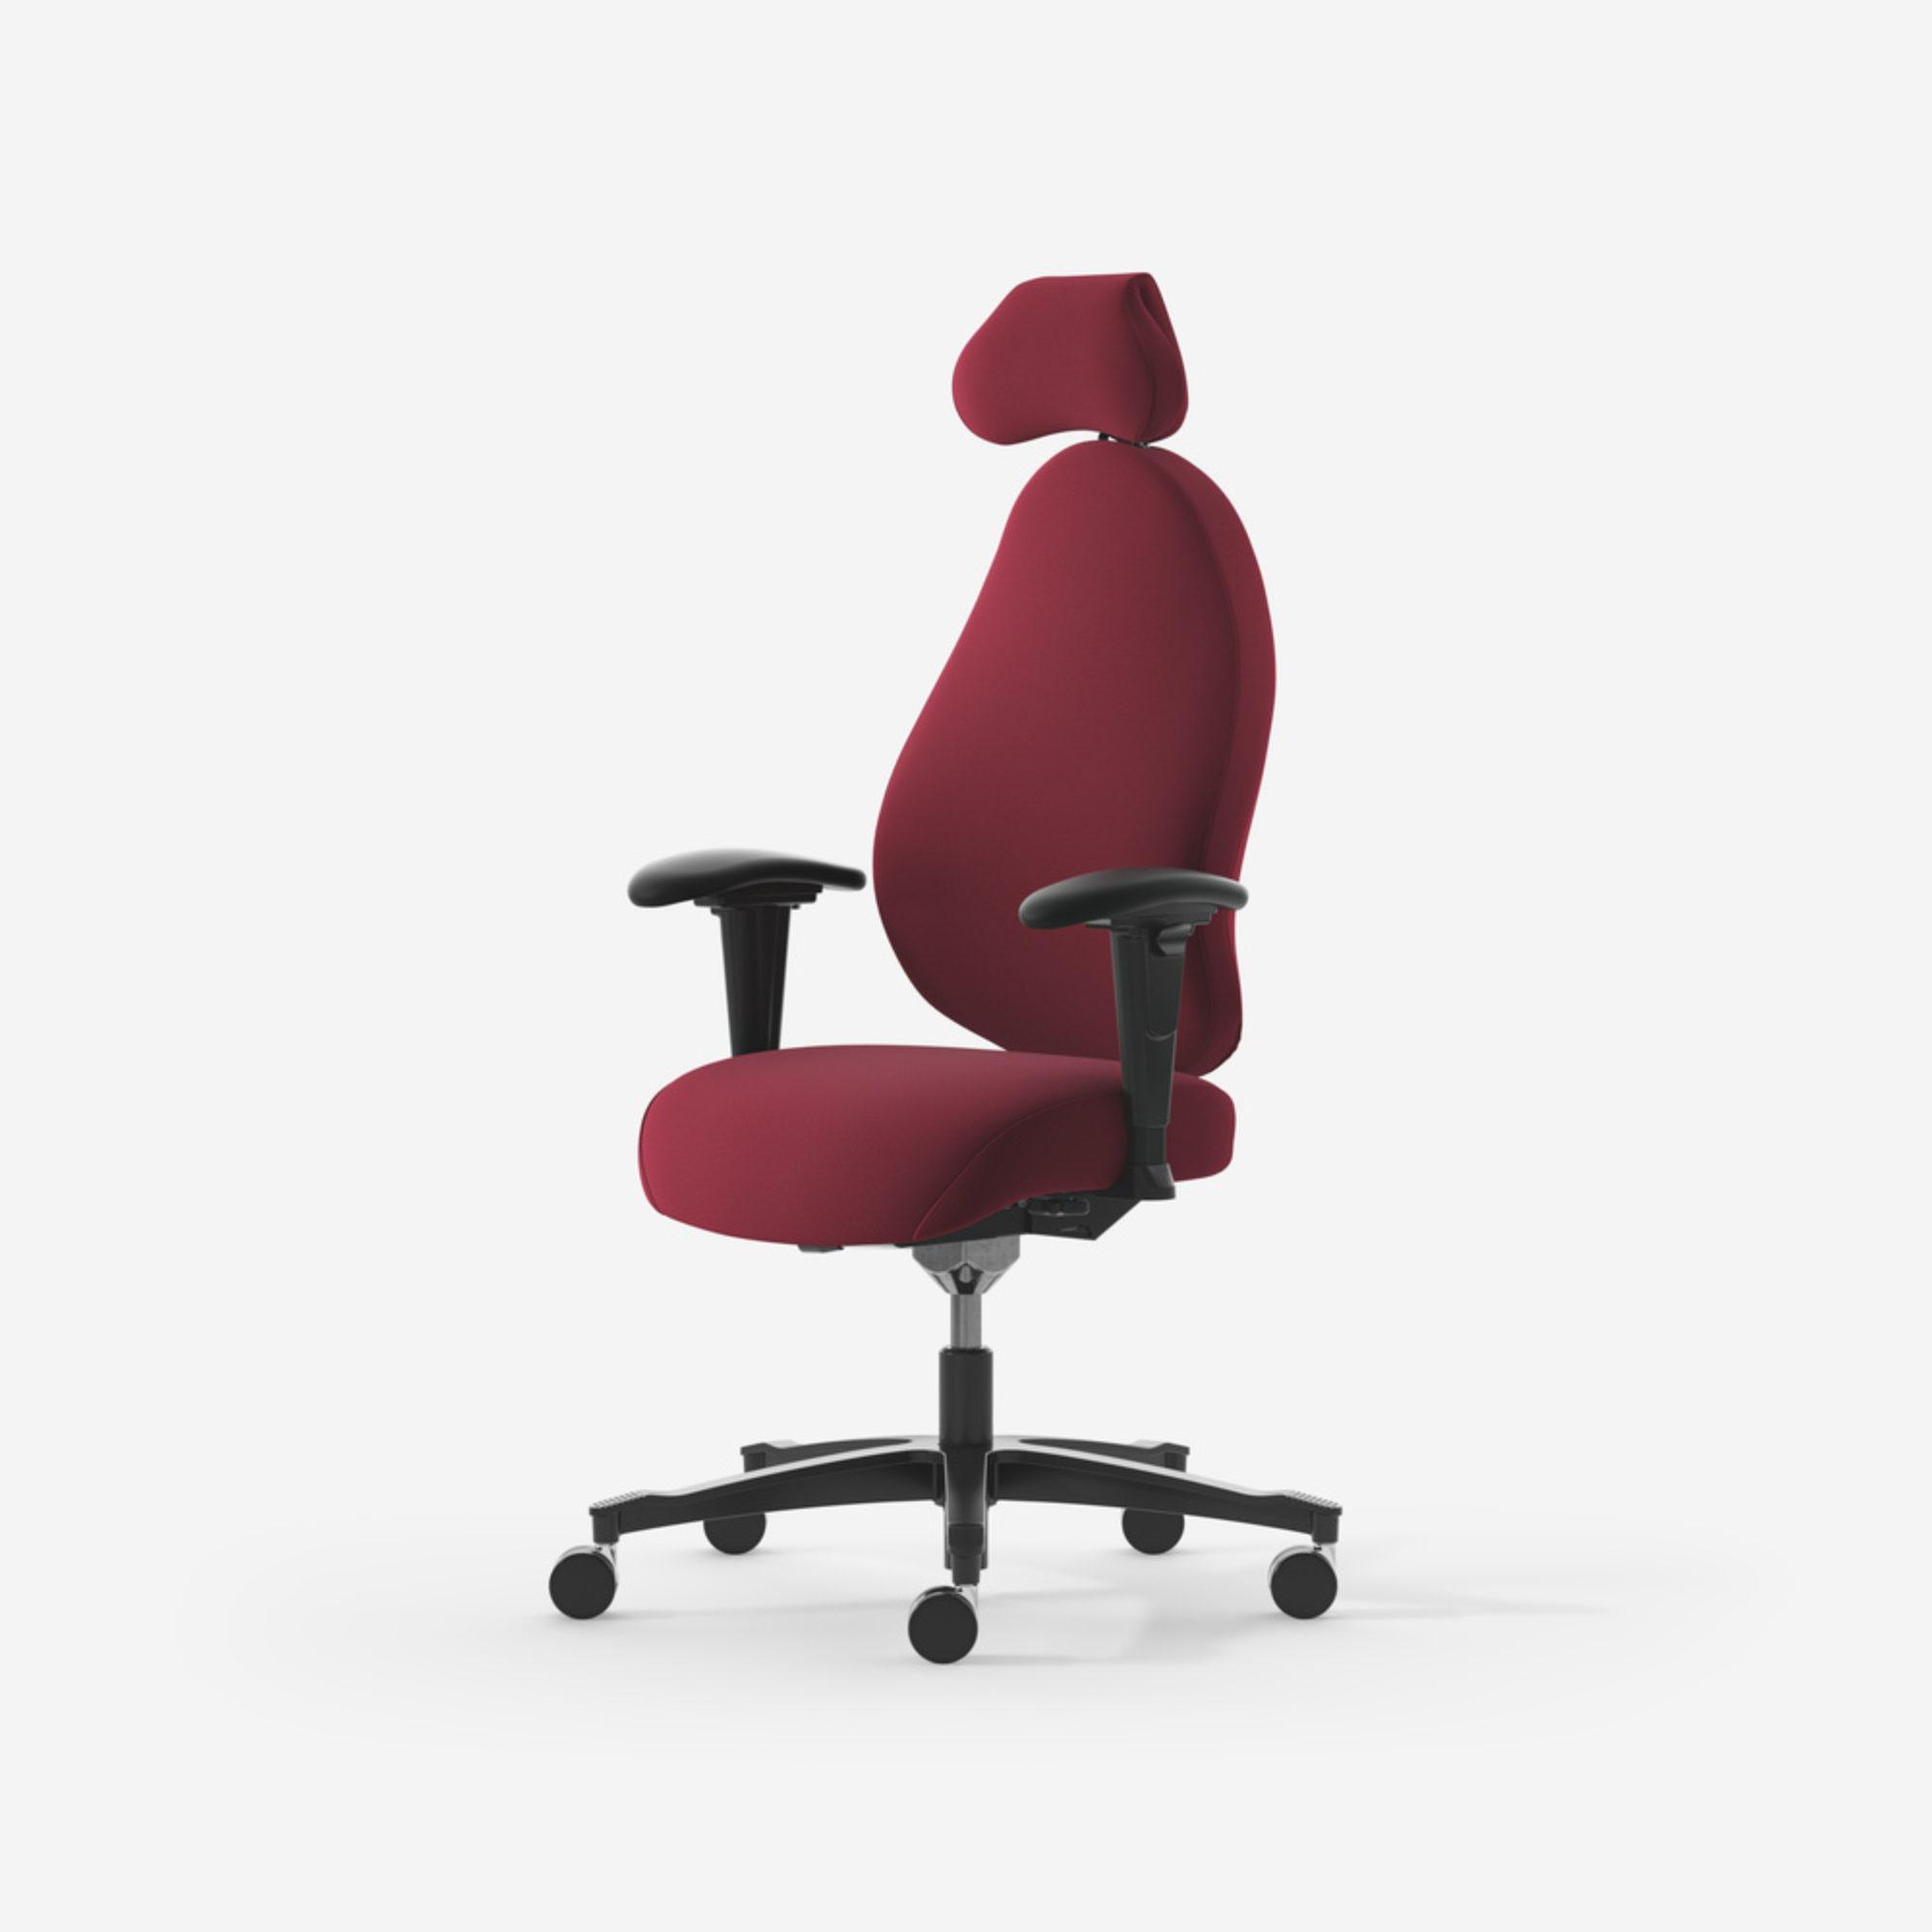 Malmstolen R2 kontorsstol ergonomisk stol